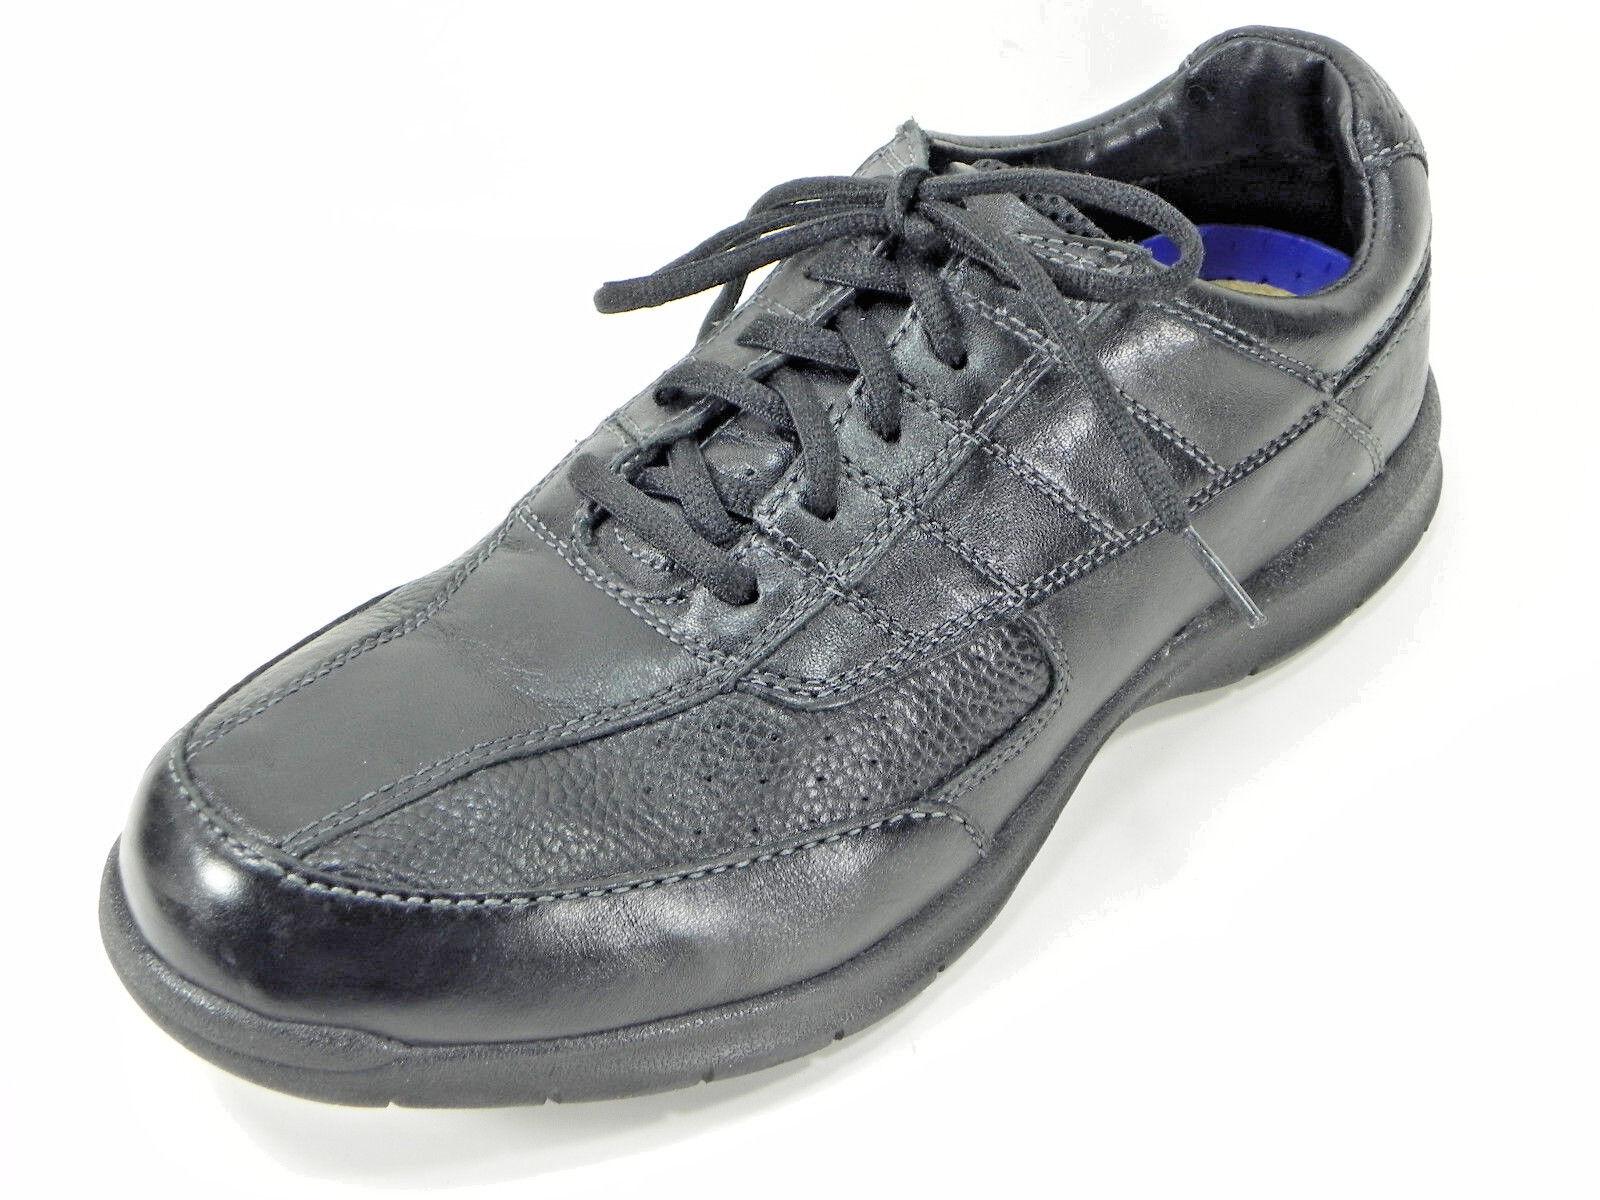 Mens Nunn Bush Oxfords Size 11.5 M Black Leather Lace Up Casual Walking shoes